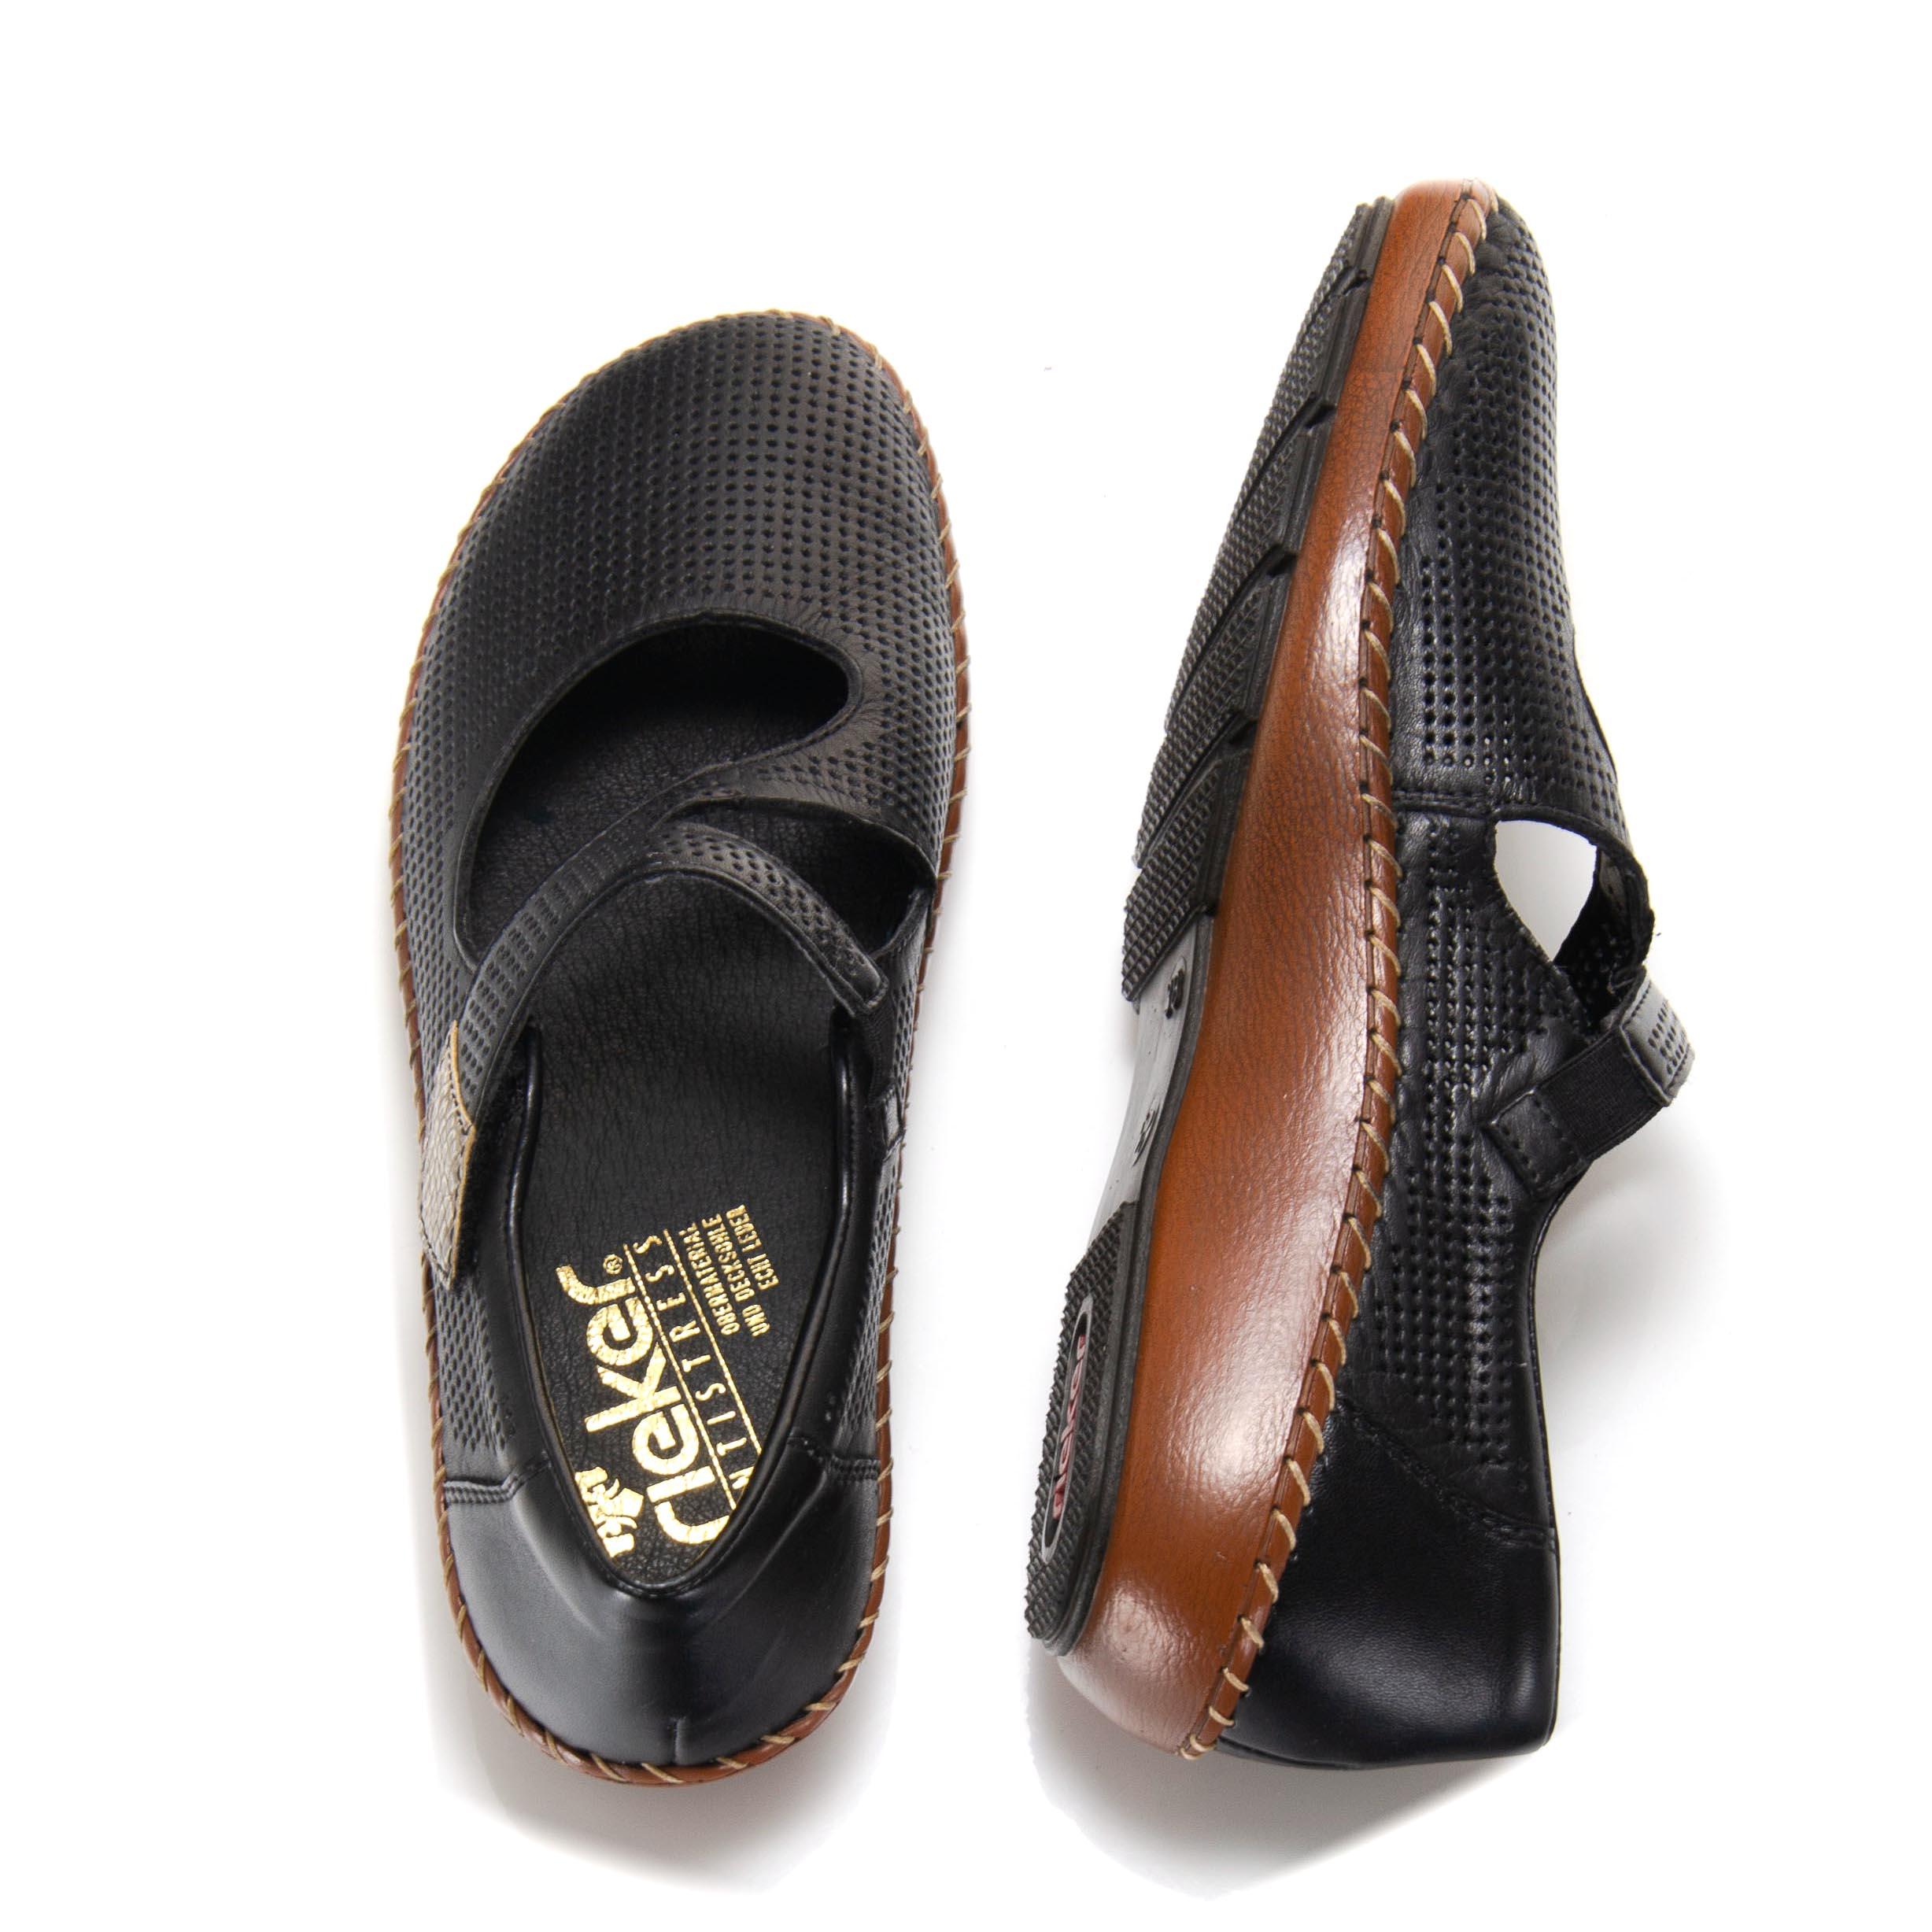 8c4d2d6f7ef detail Dámska obuv RIEKER br 44876-00 SCHWARZ ...